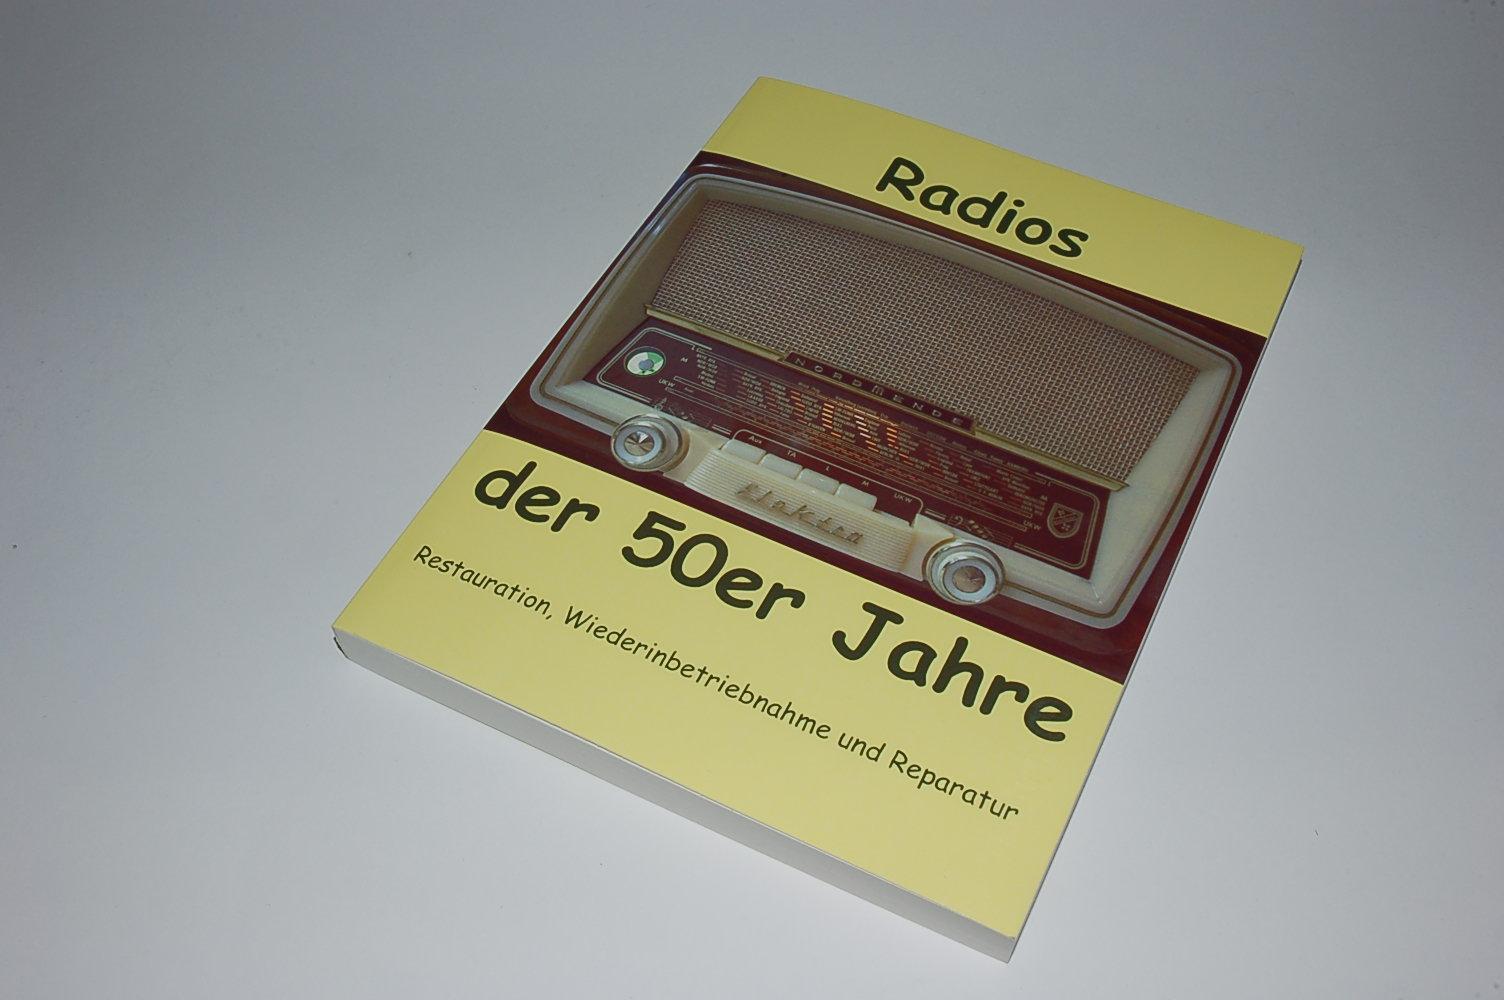 radios_50er_b1